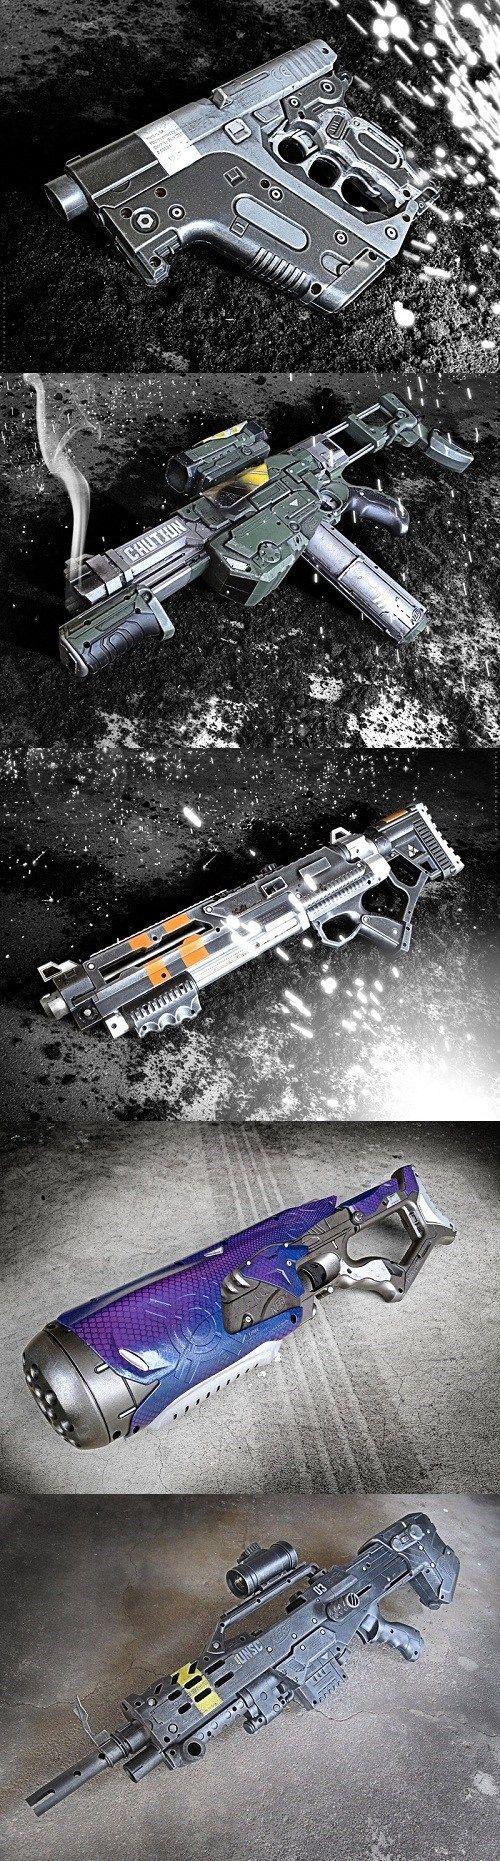 Halo Inspired Nerf Guns